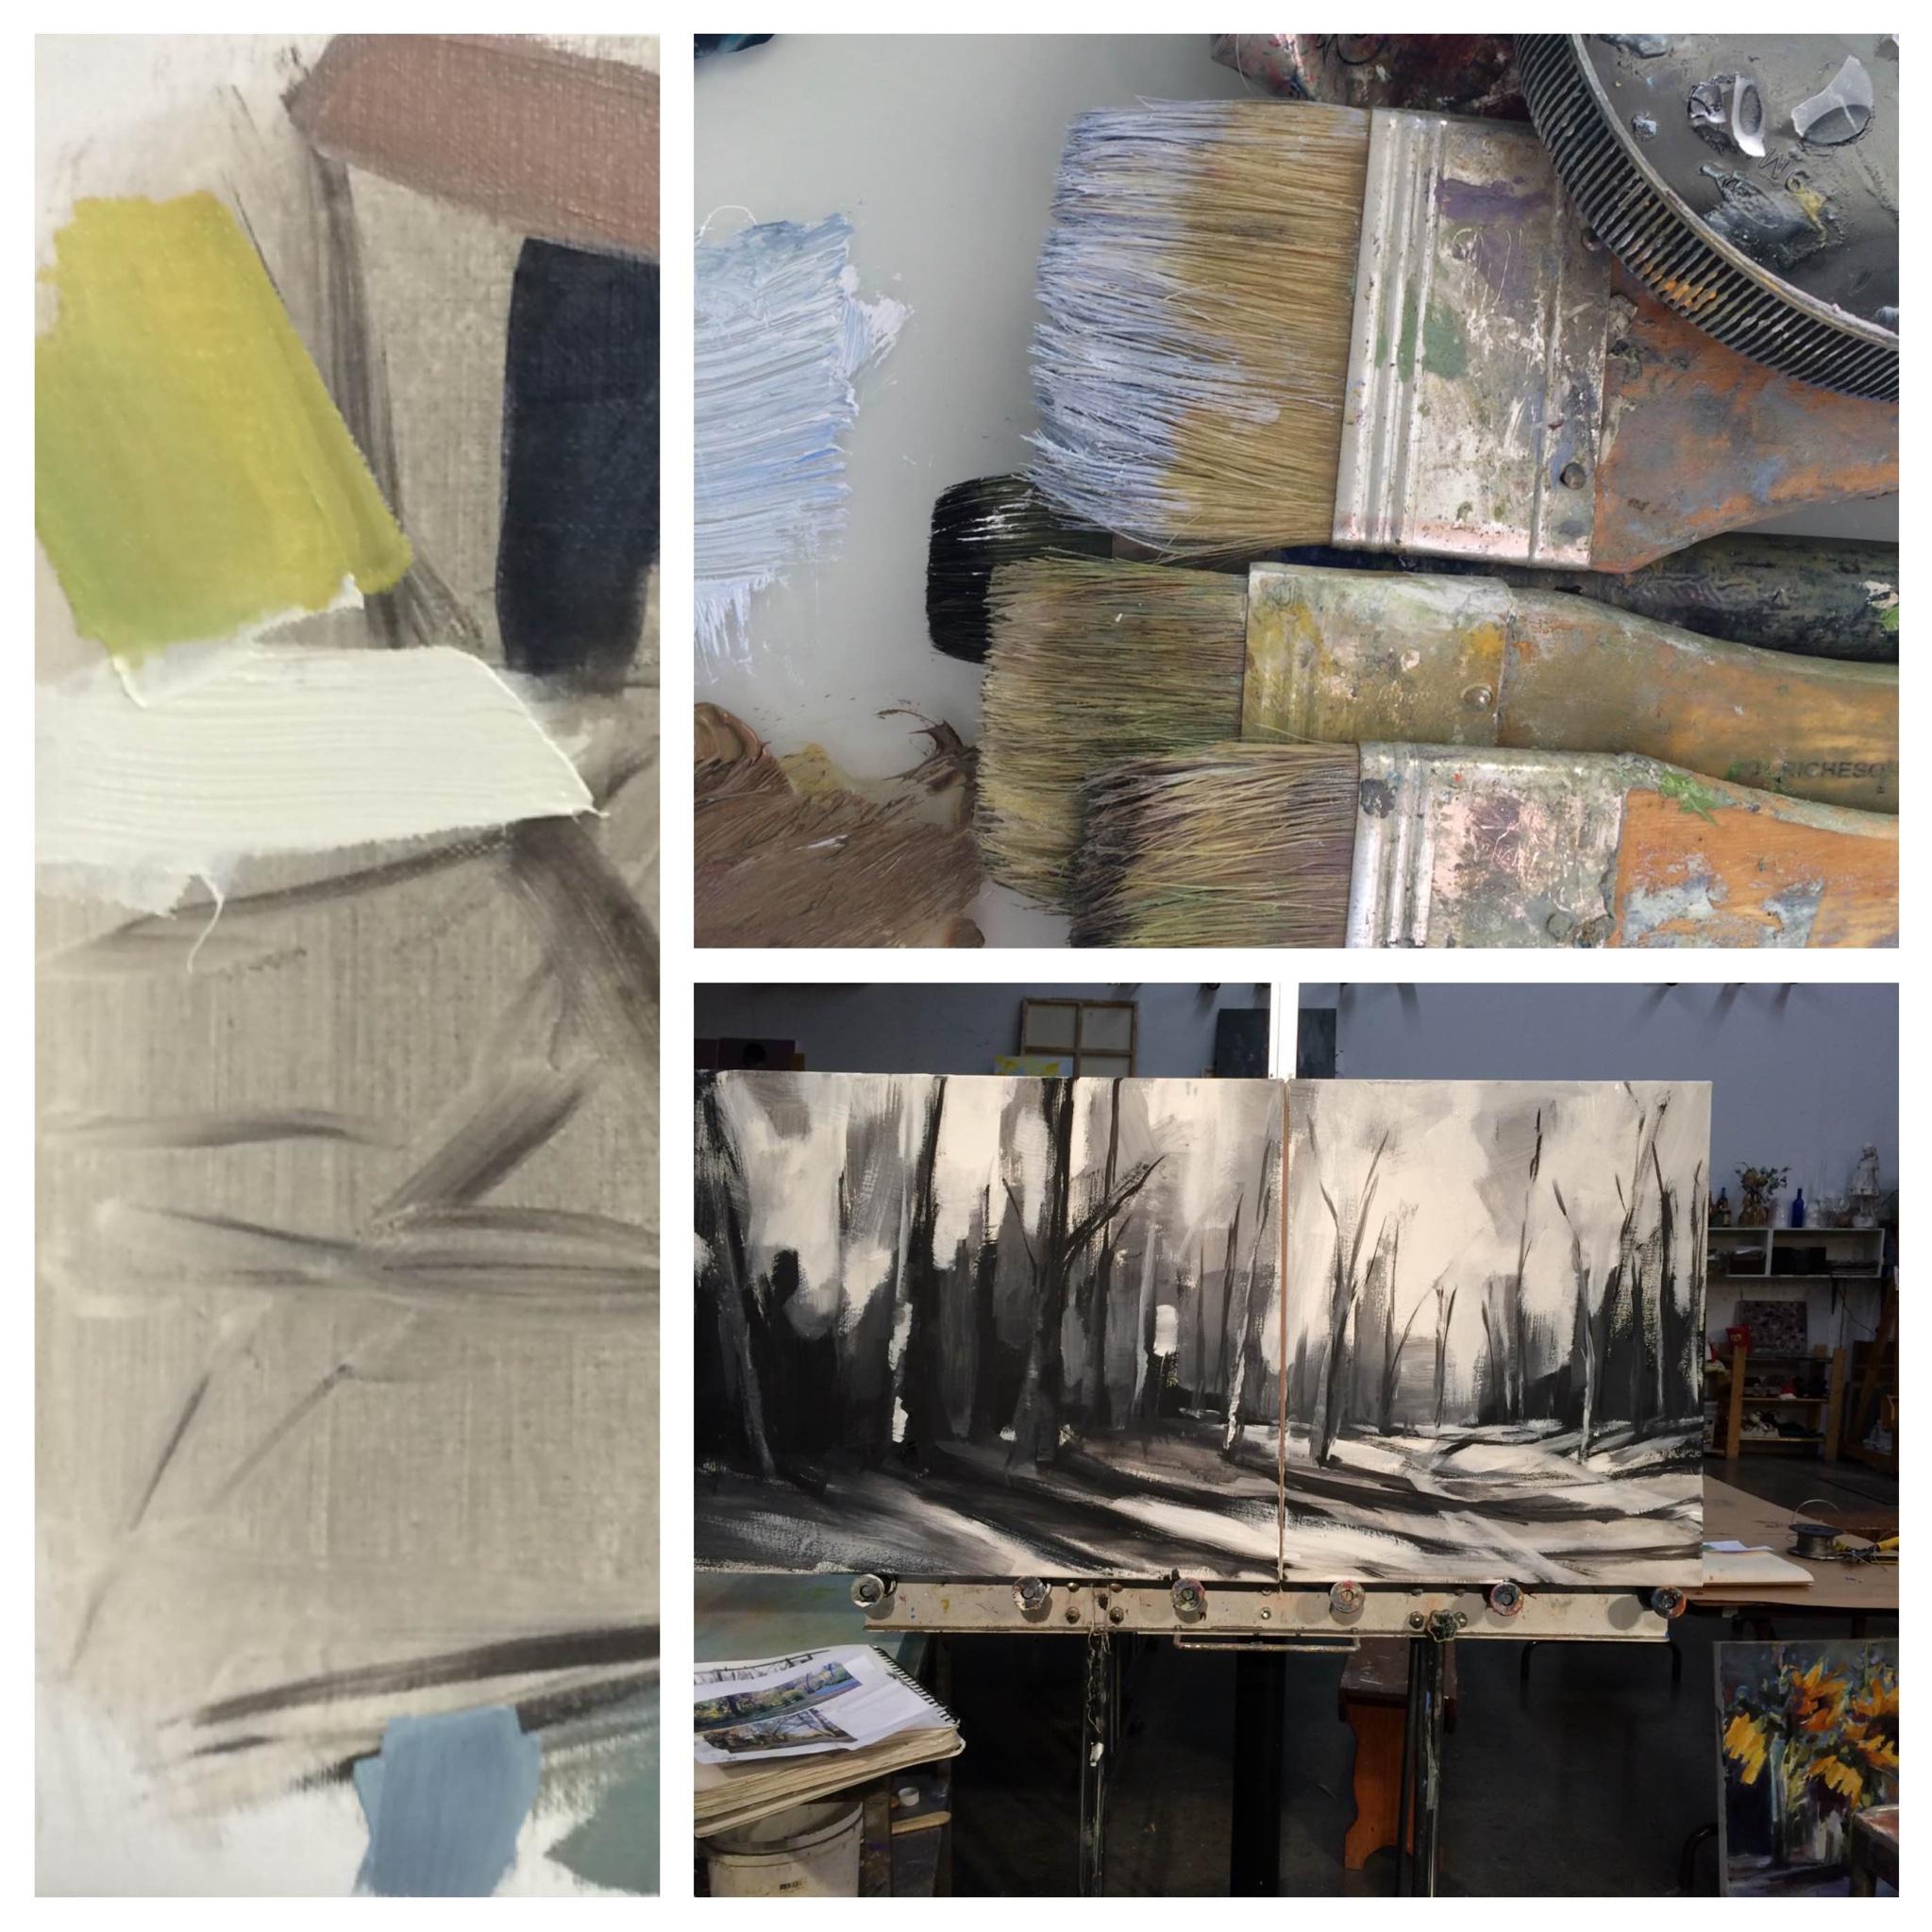 Winter color studies and paintings in progress! #throwbackthursday #kelleybrughfineart #oilpaintings